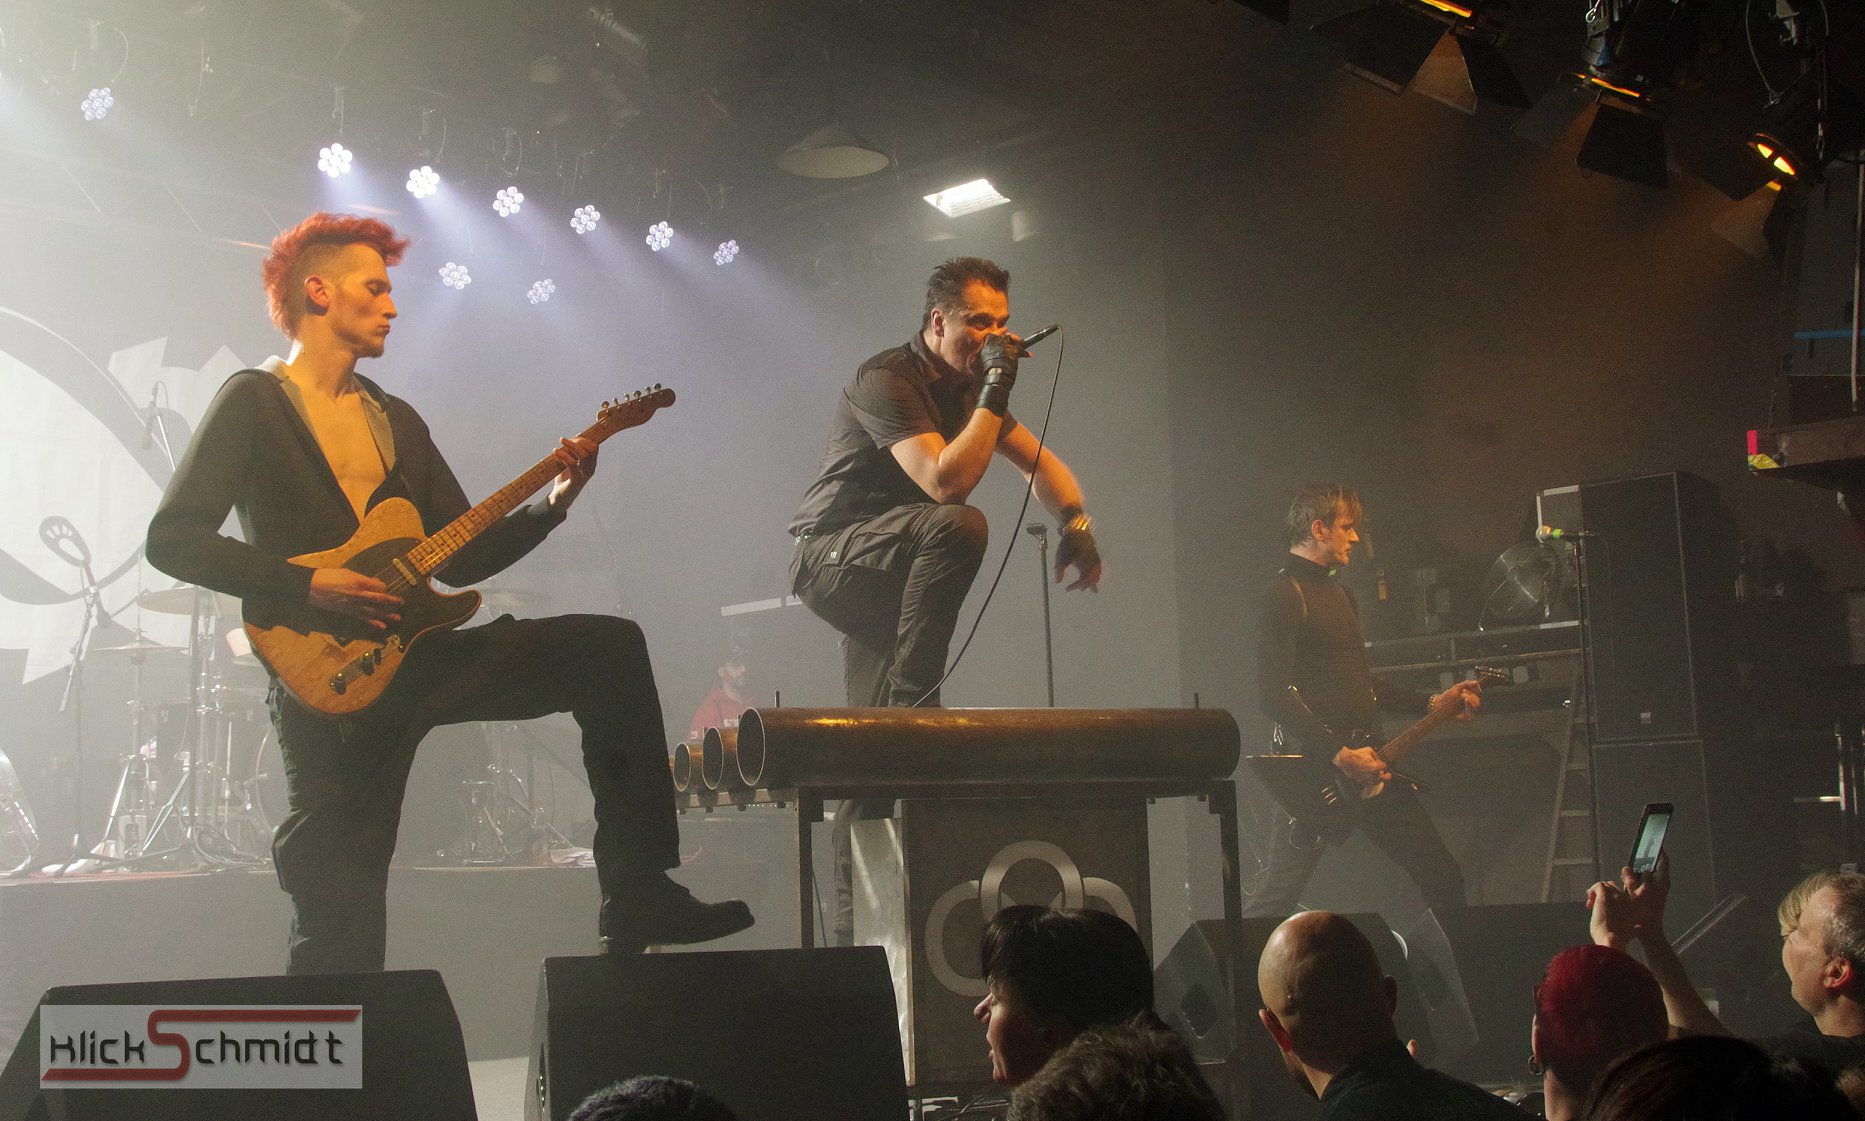 Die Krupps – Live in Glauchau